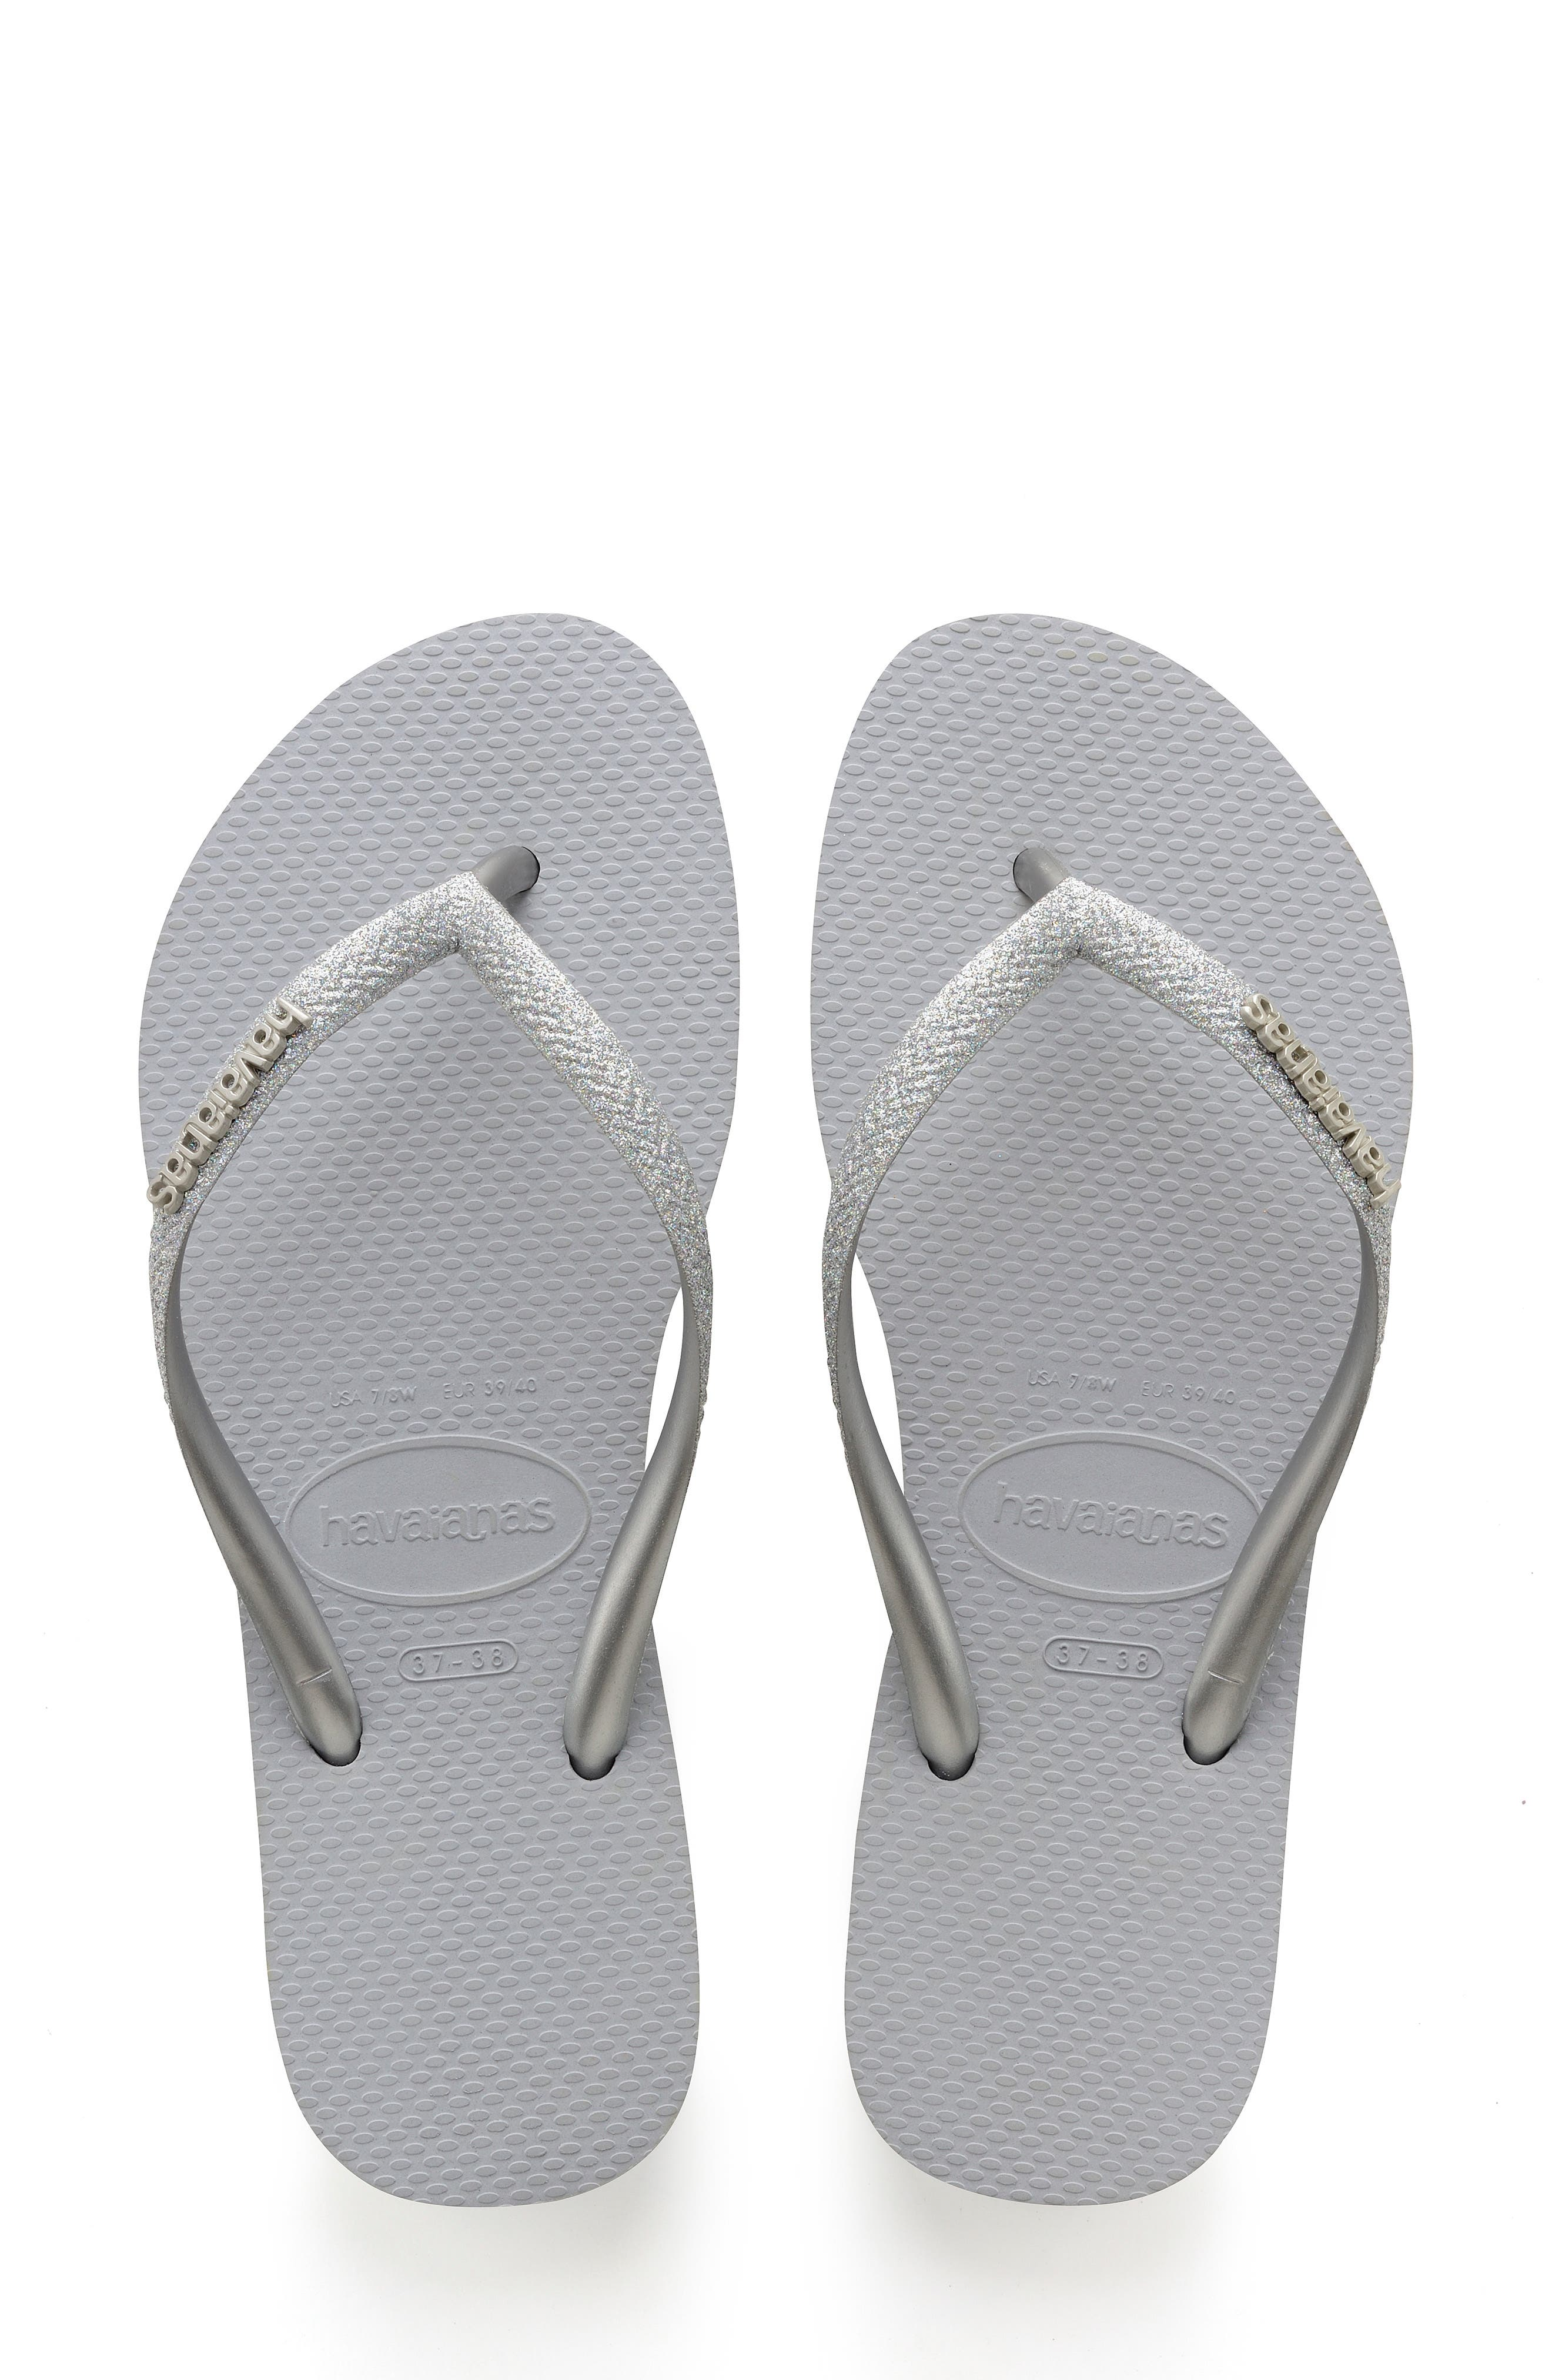 7c4c965a74e6 Women s Flip Flops New Arrivals  Clothing